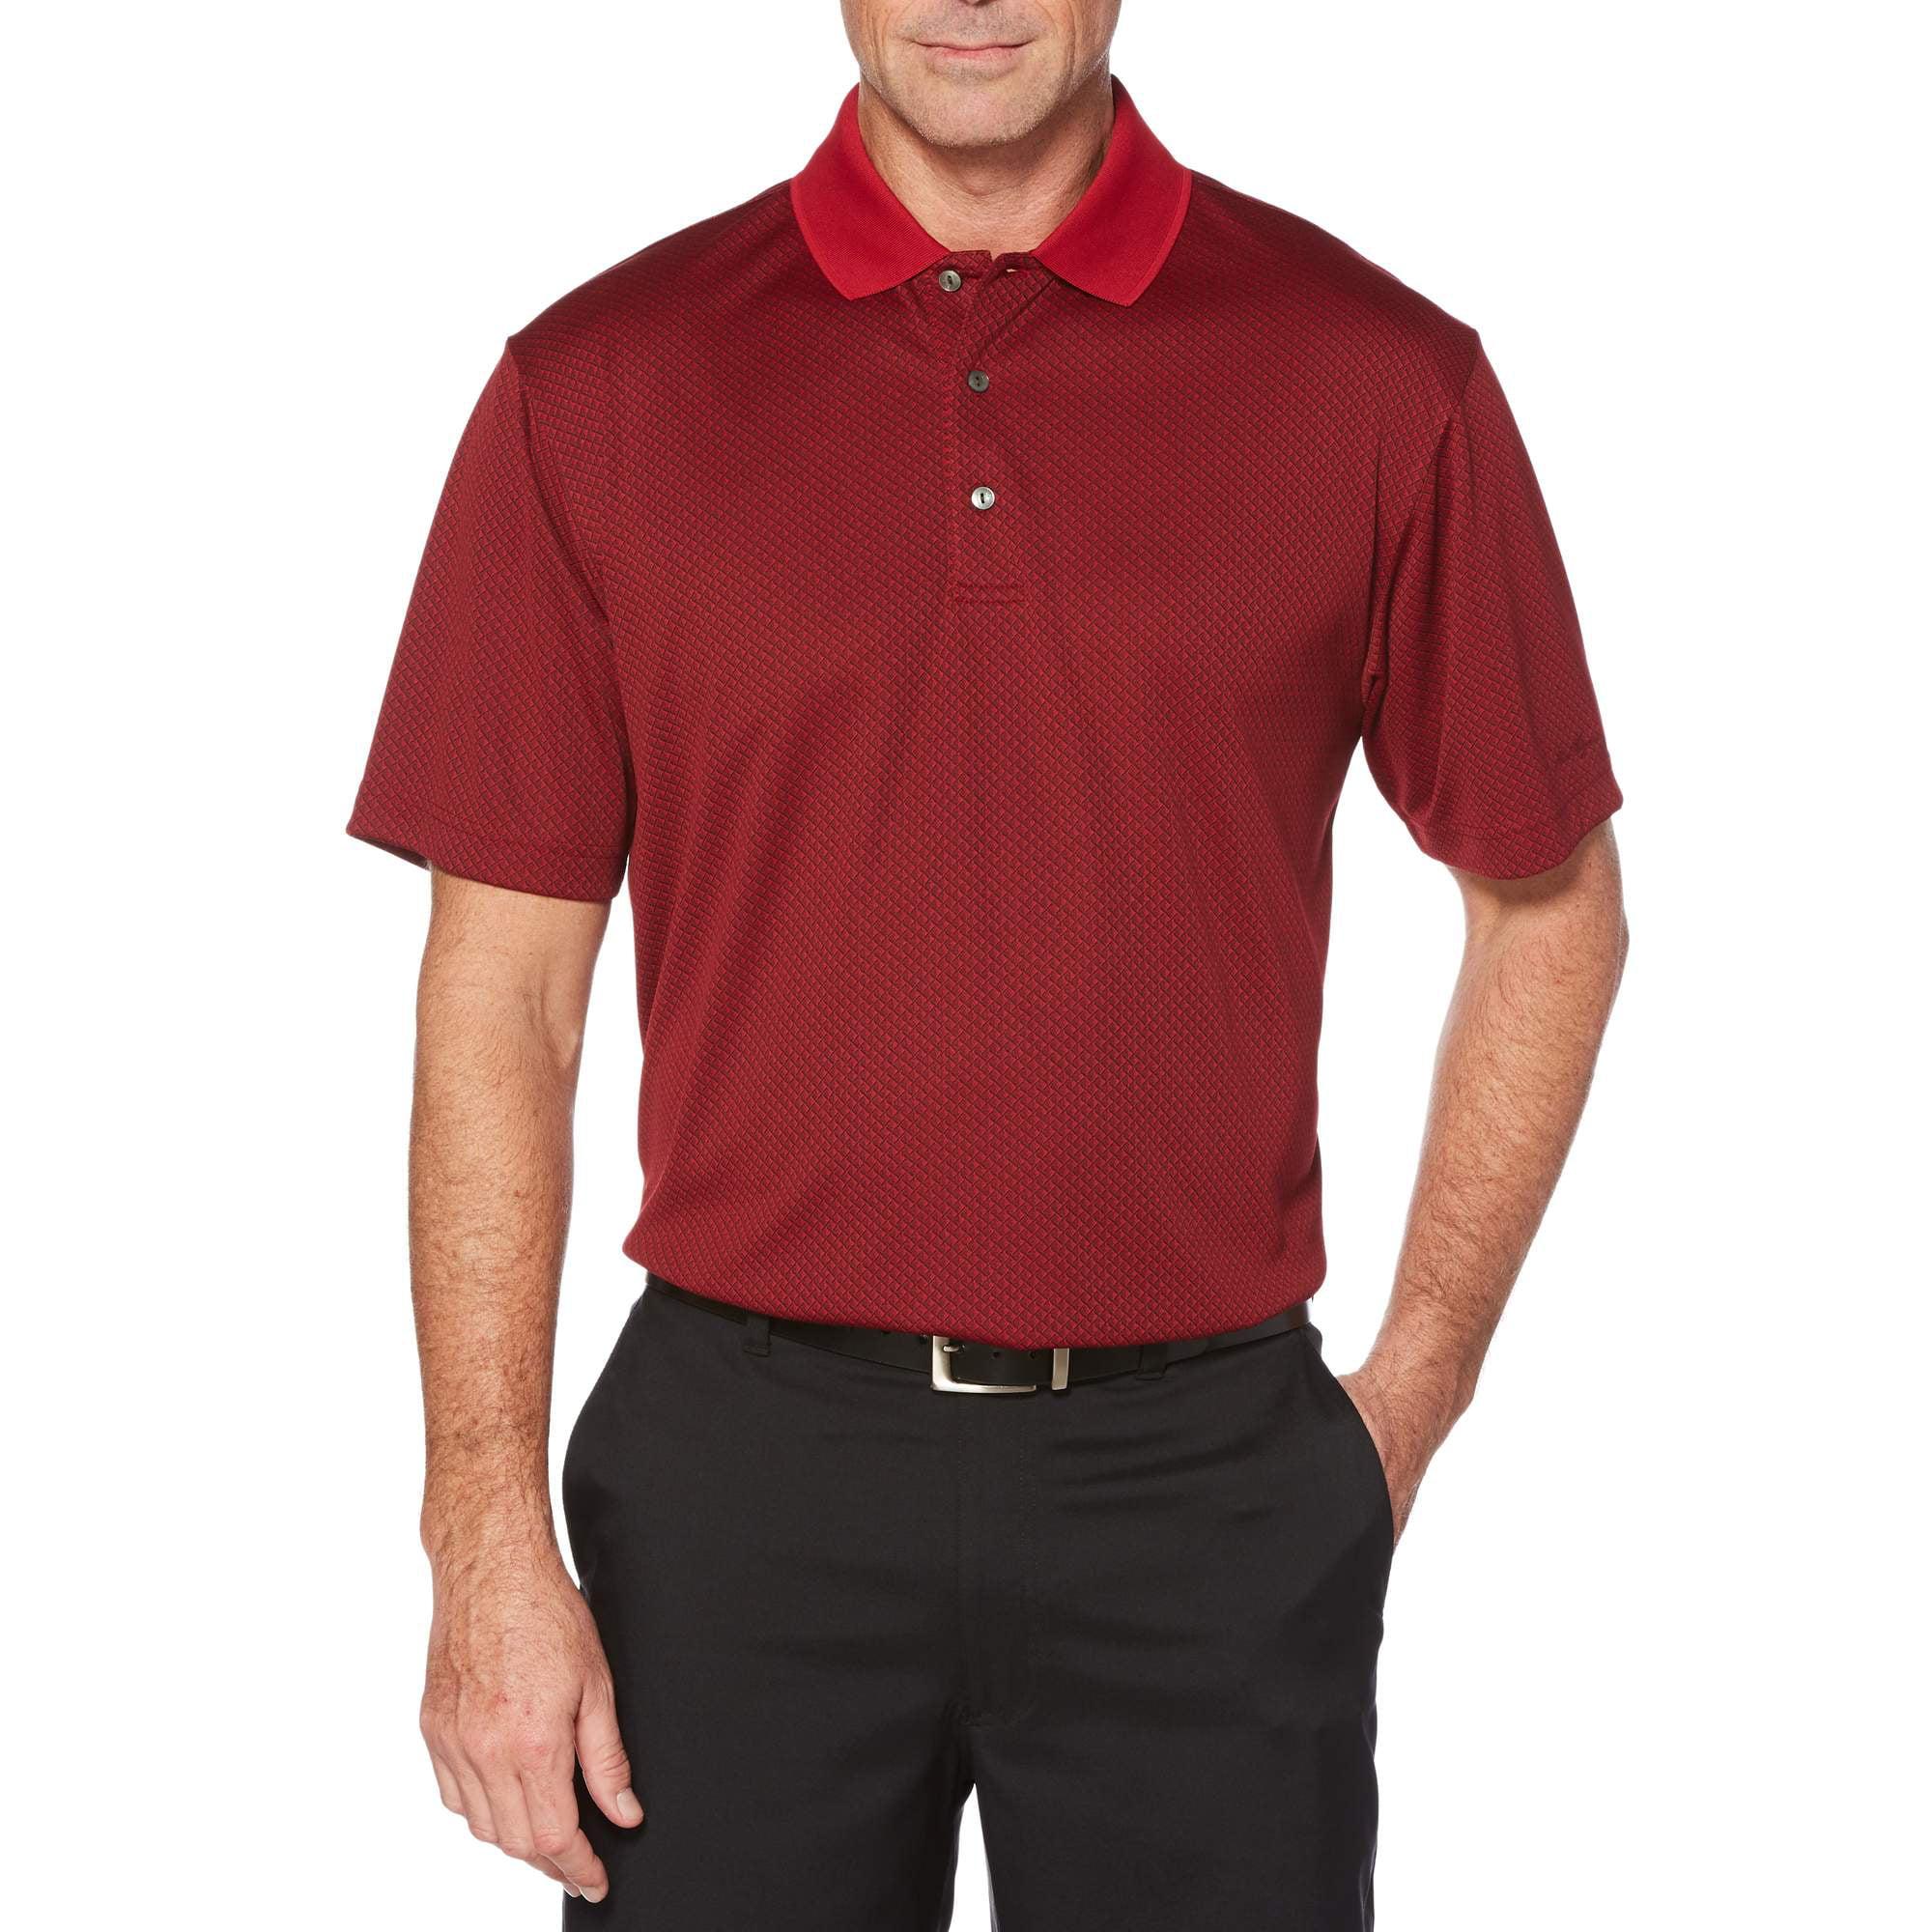 Big Men's Performance Short Sleeve Textured Golf Polo